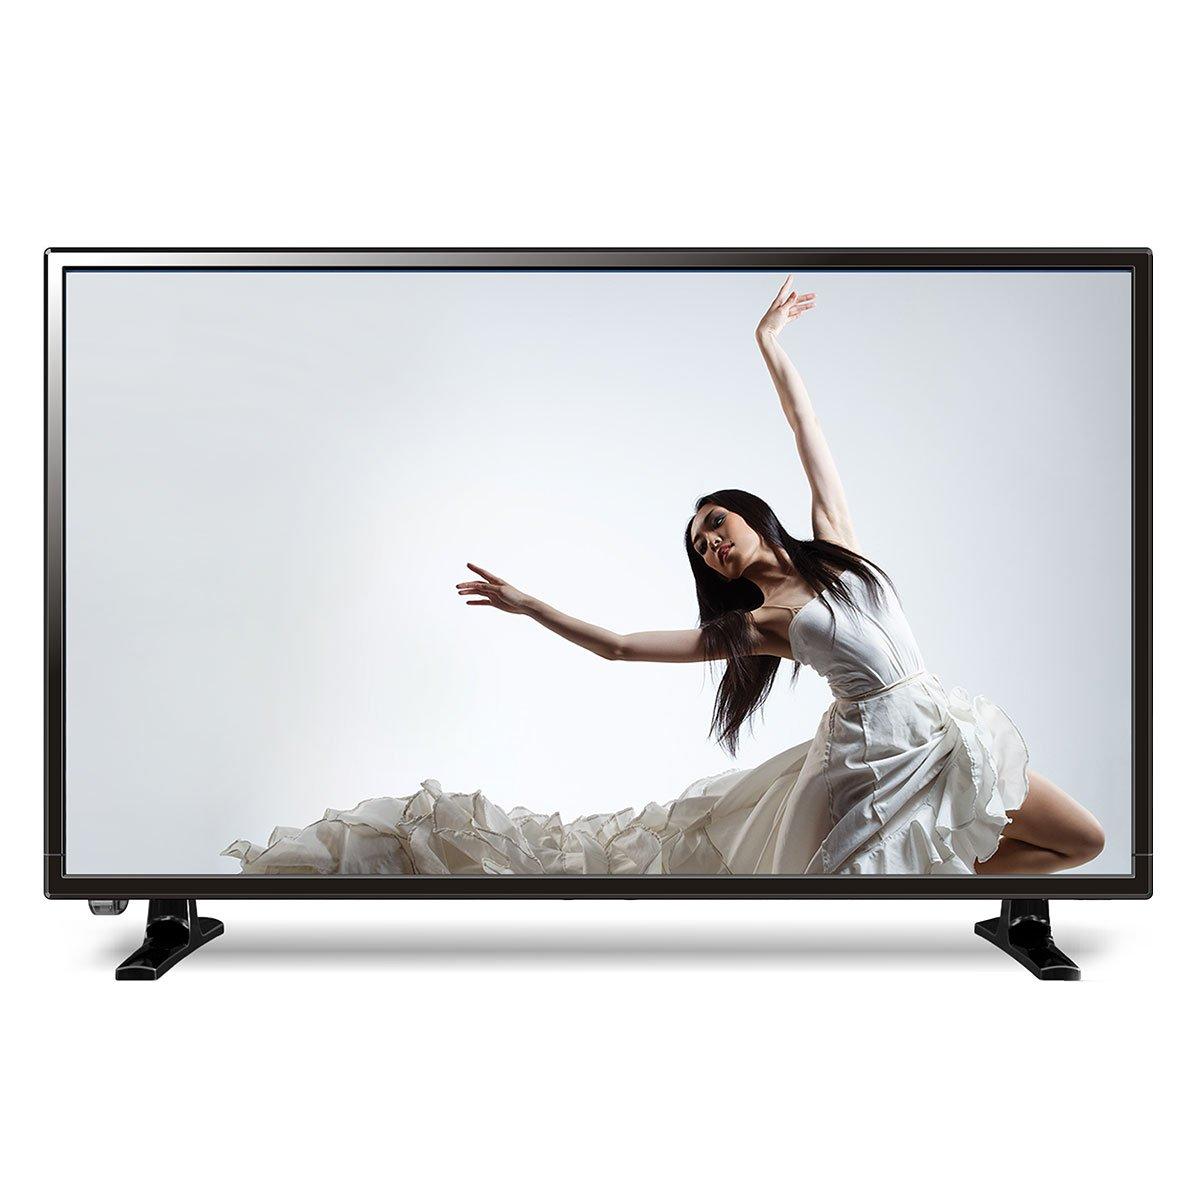 haier 75 inch tv. haier 75 inch tv